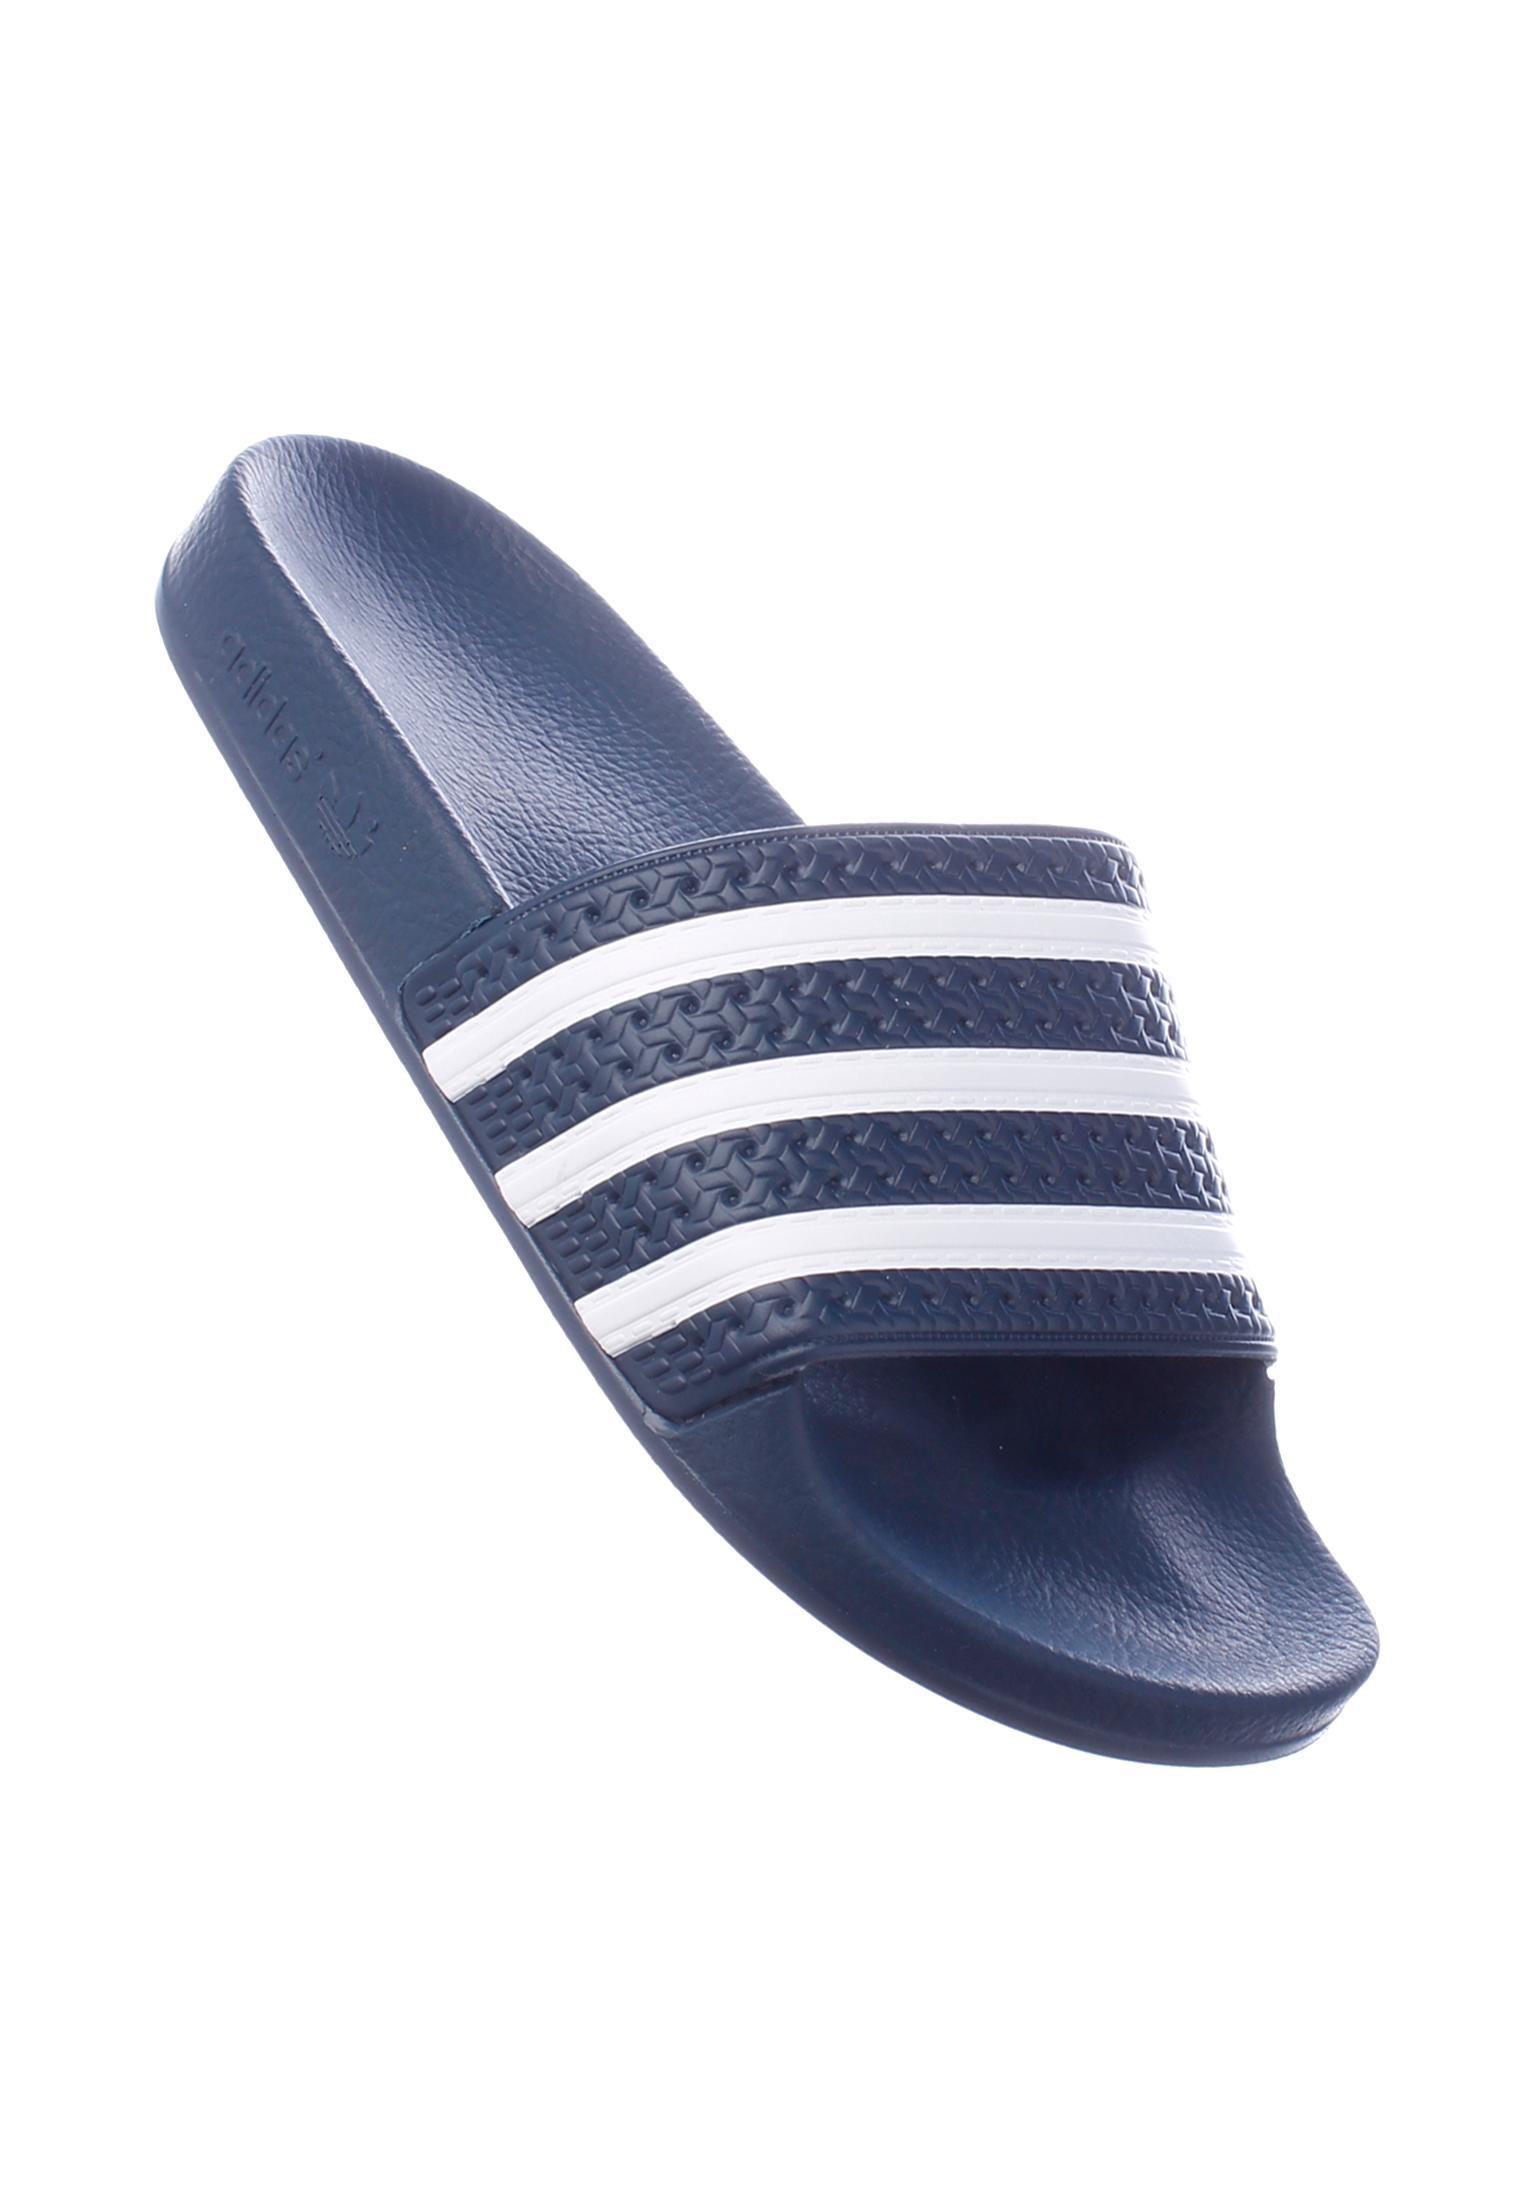 Adilette adidas Sandals in blue-white